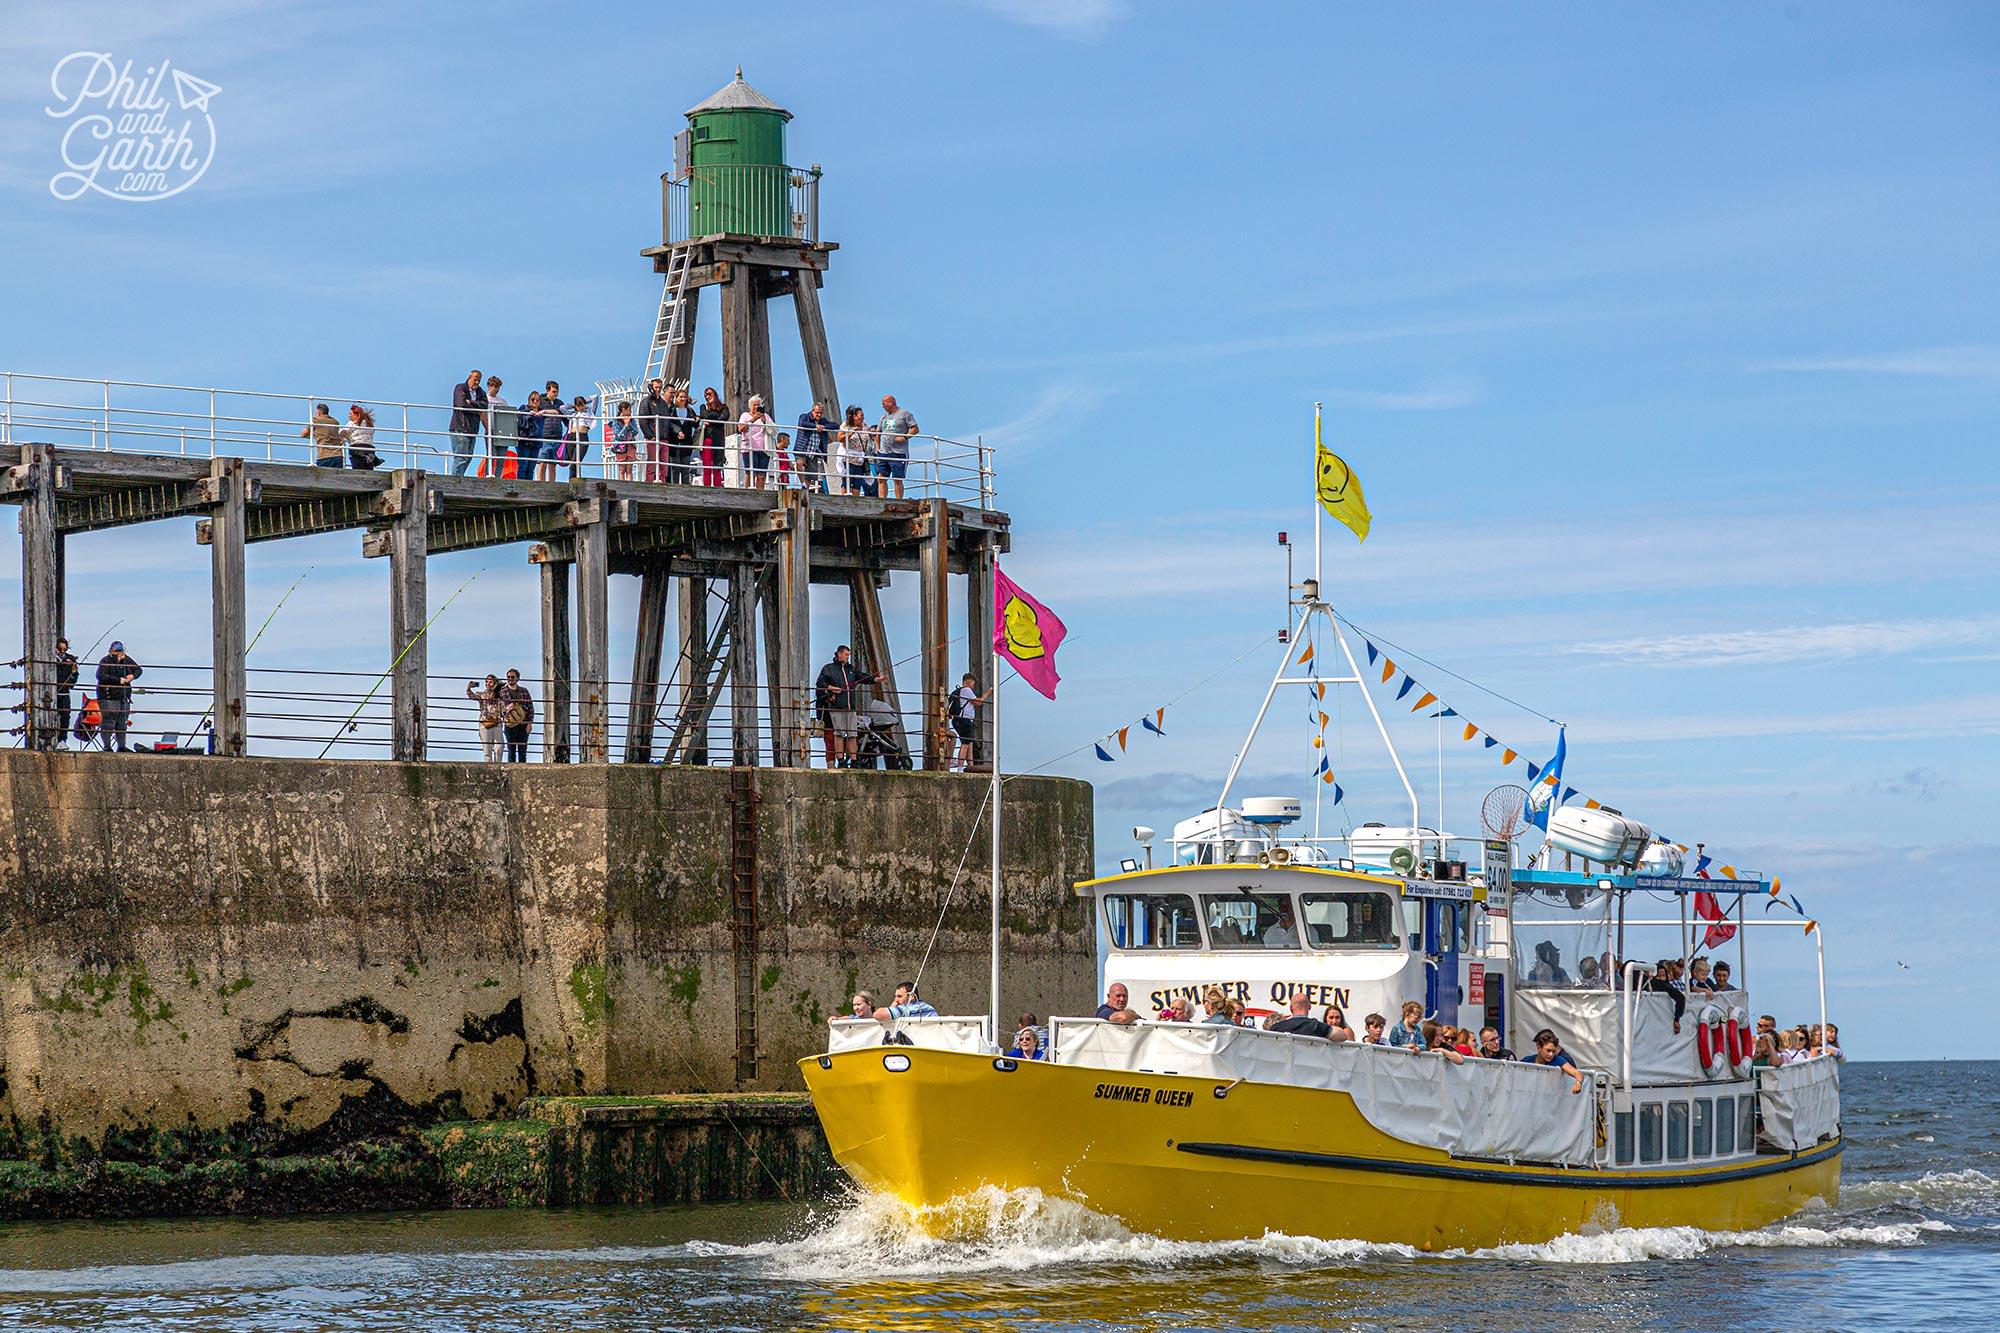 Whitby harbour pleasure boat cruises last around 20 minutes